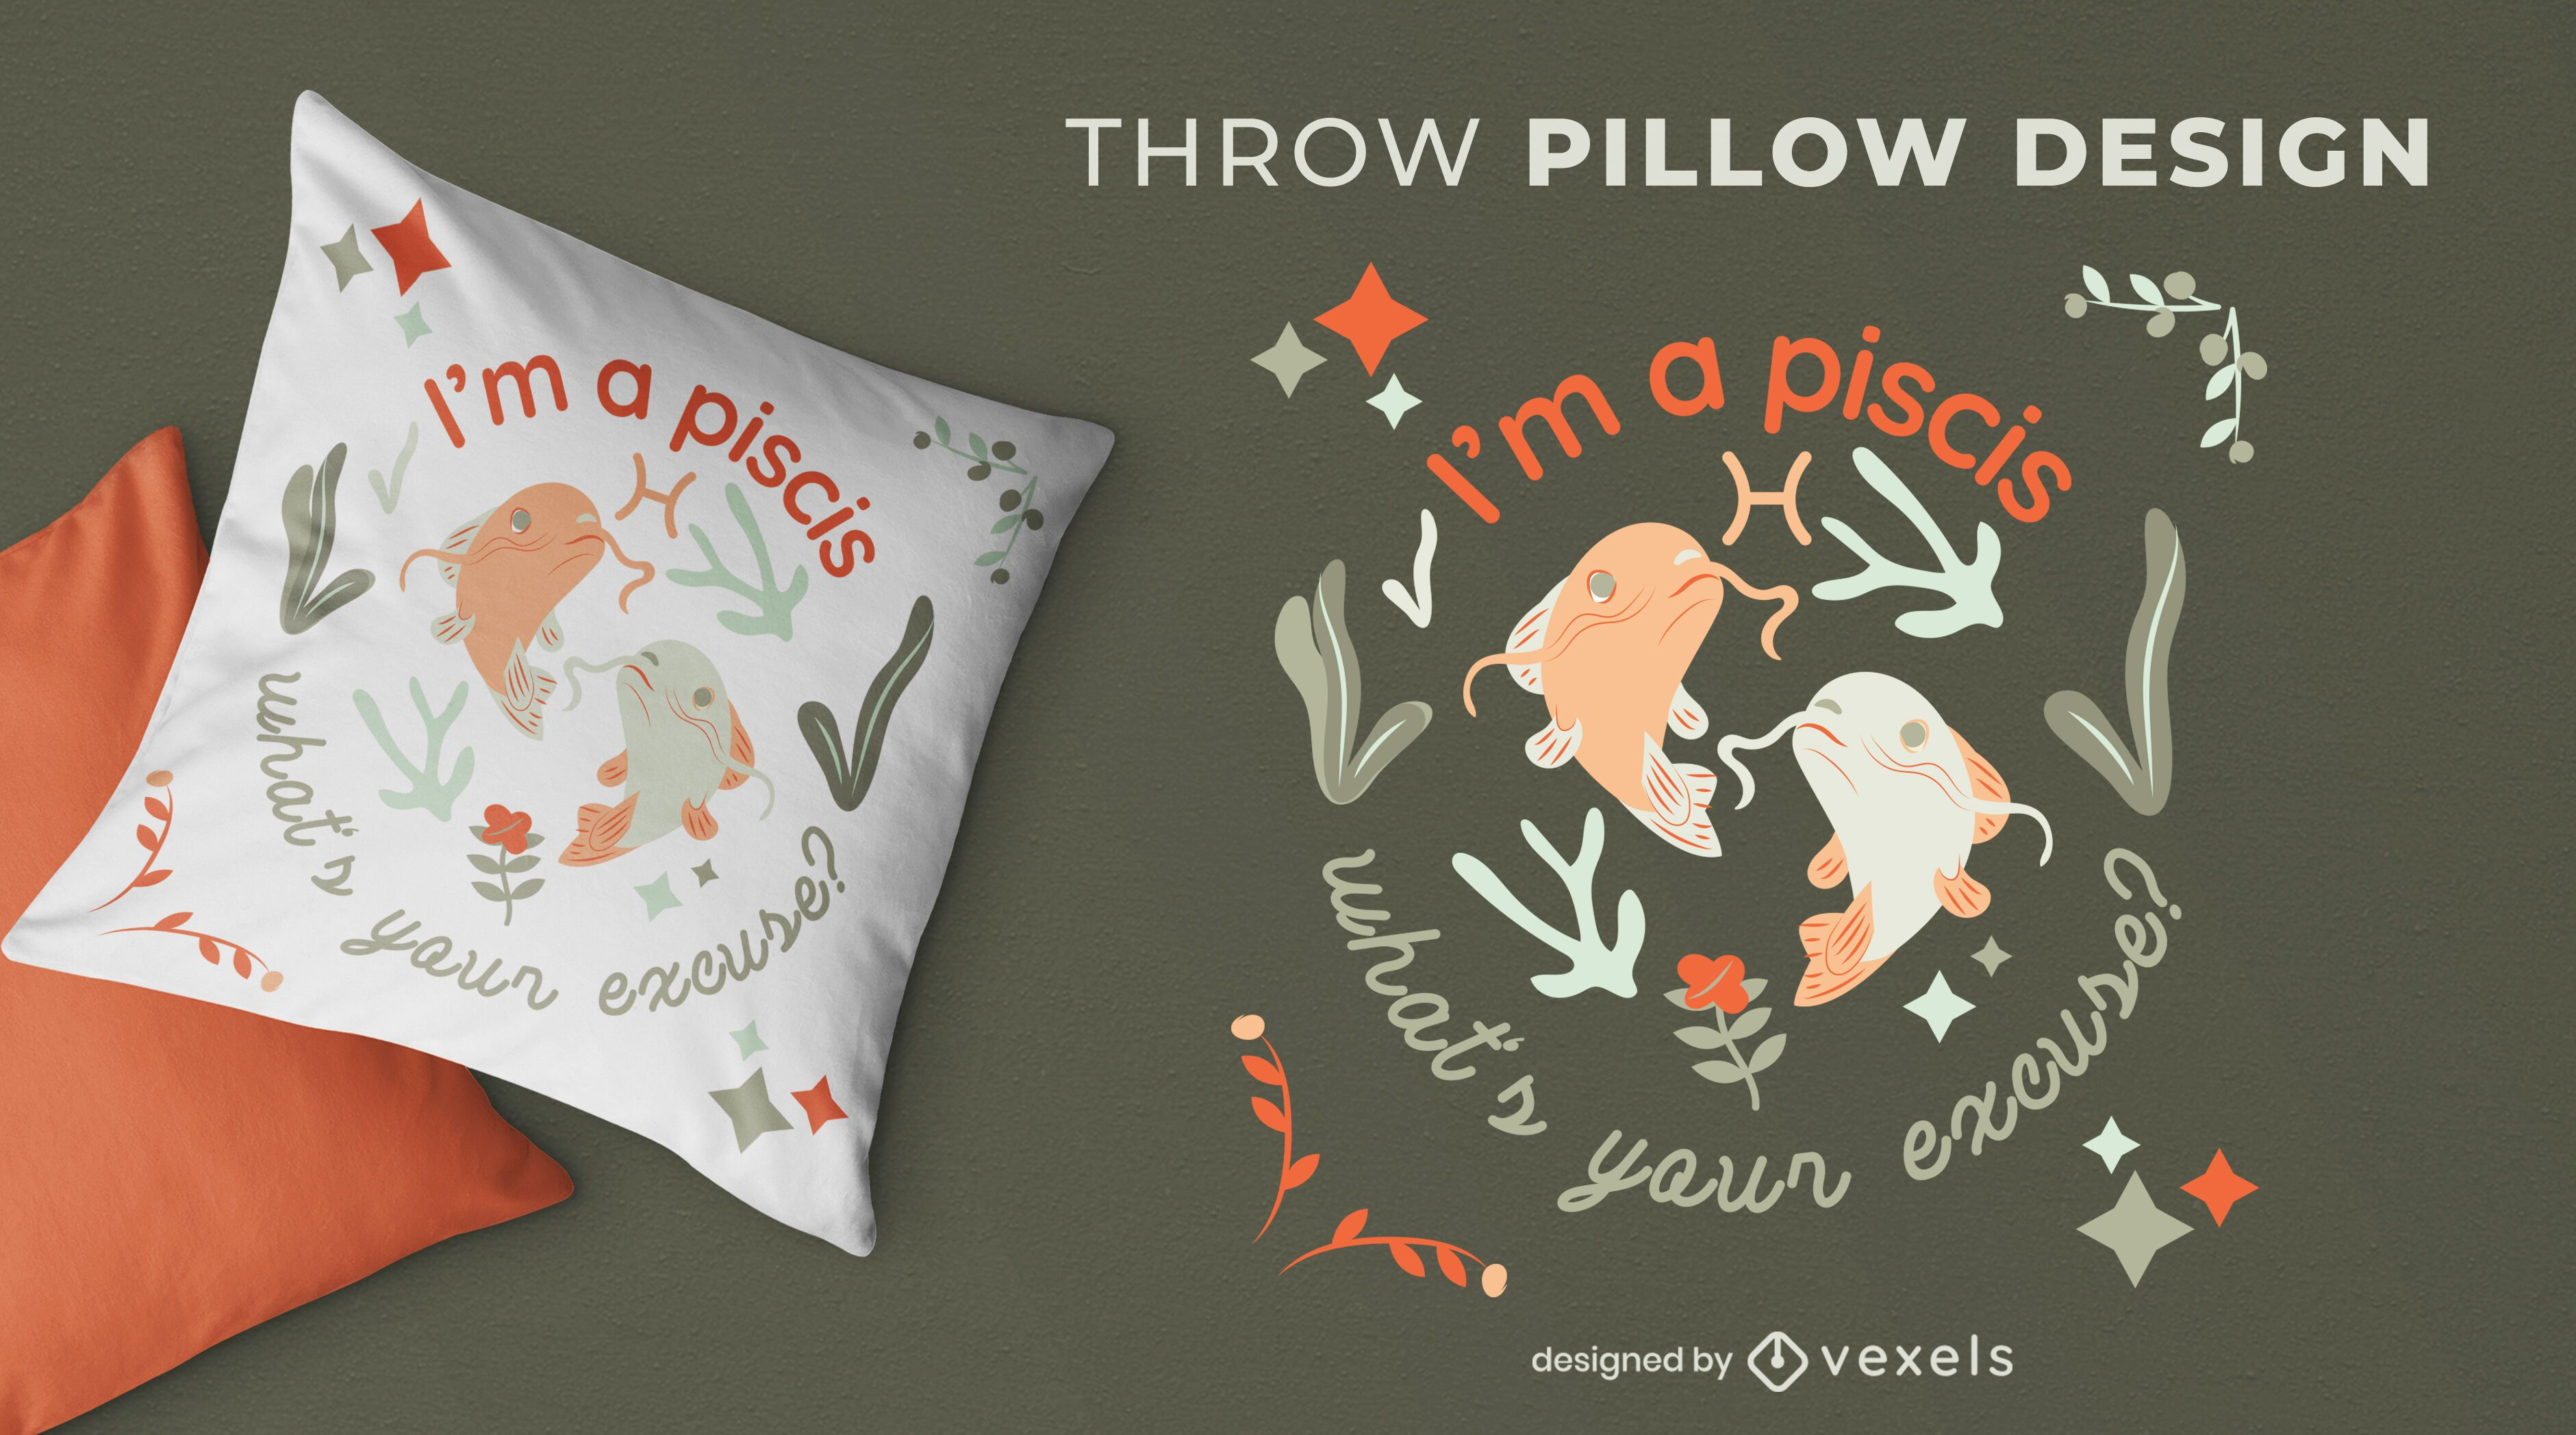 Diseño de almohada de tiro del zodiaco Piscis